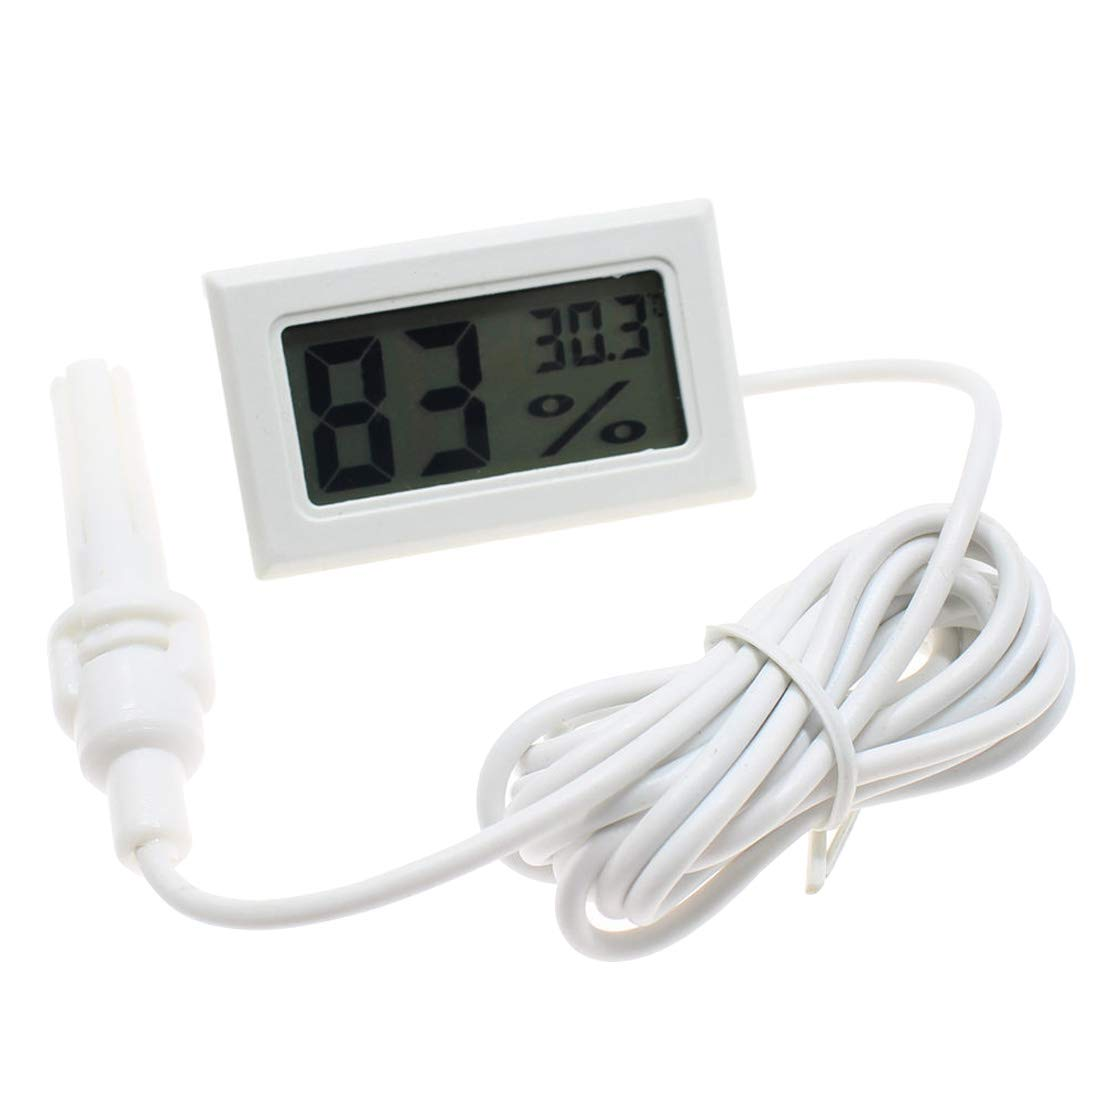 Sonda LCD Digital Mini Term/ómetro Integrado Higr/ómetro Medidor de Humedad Medidor Sonda para Reptil